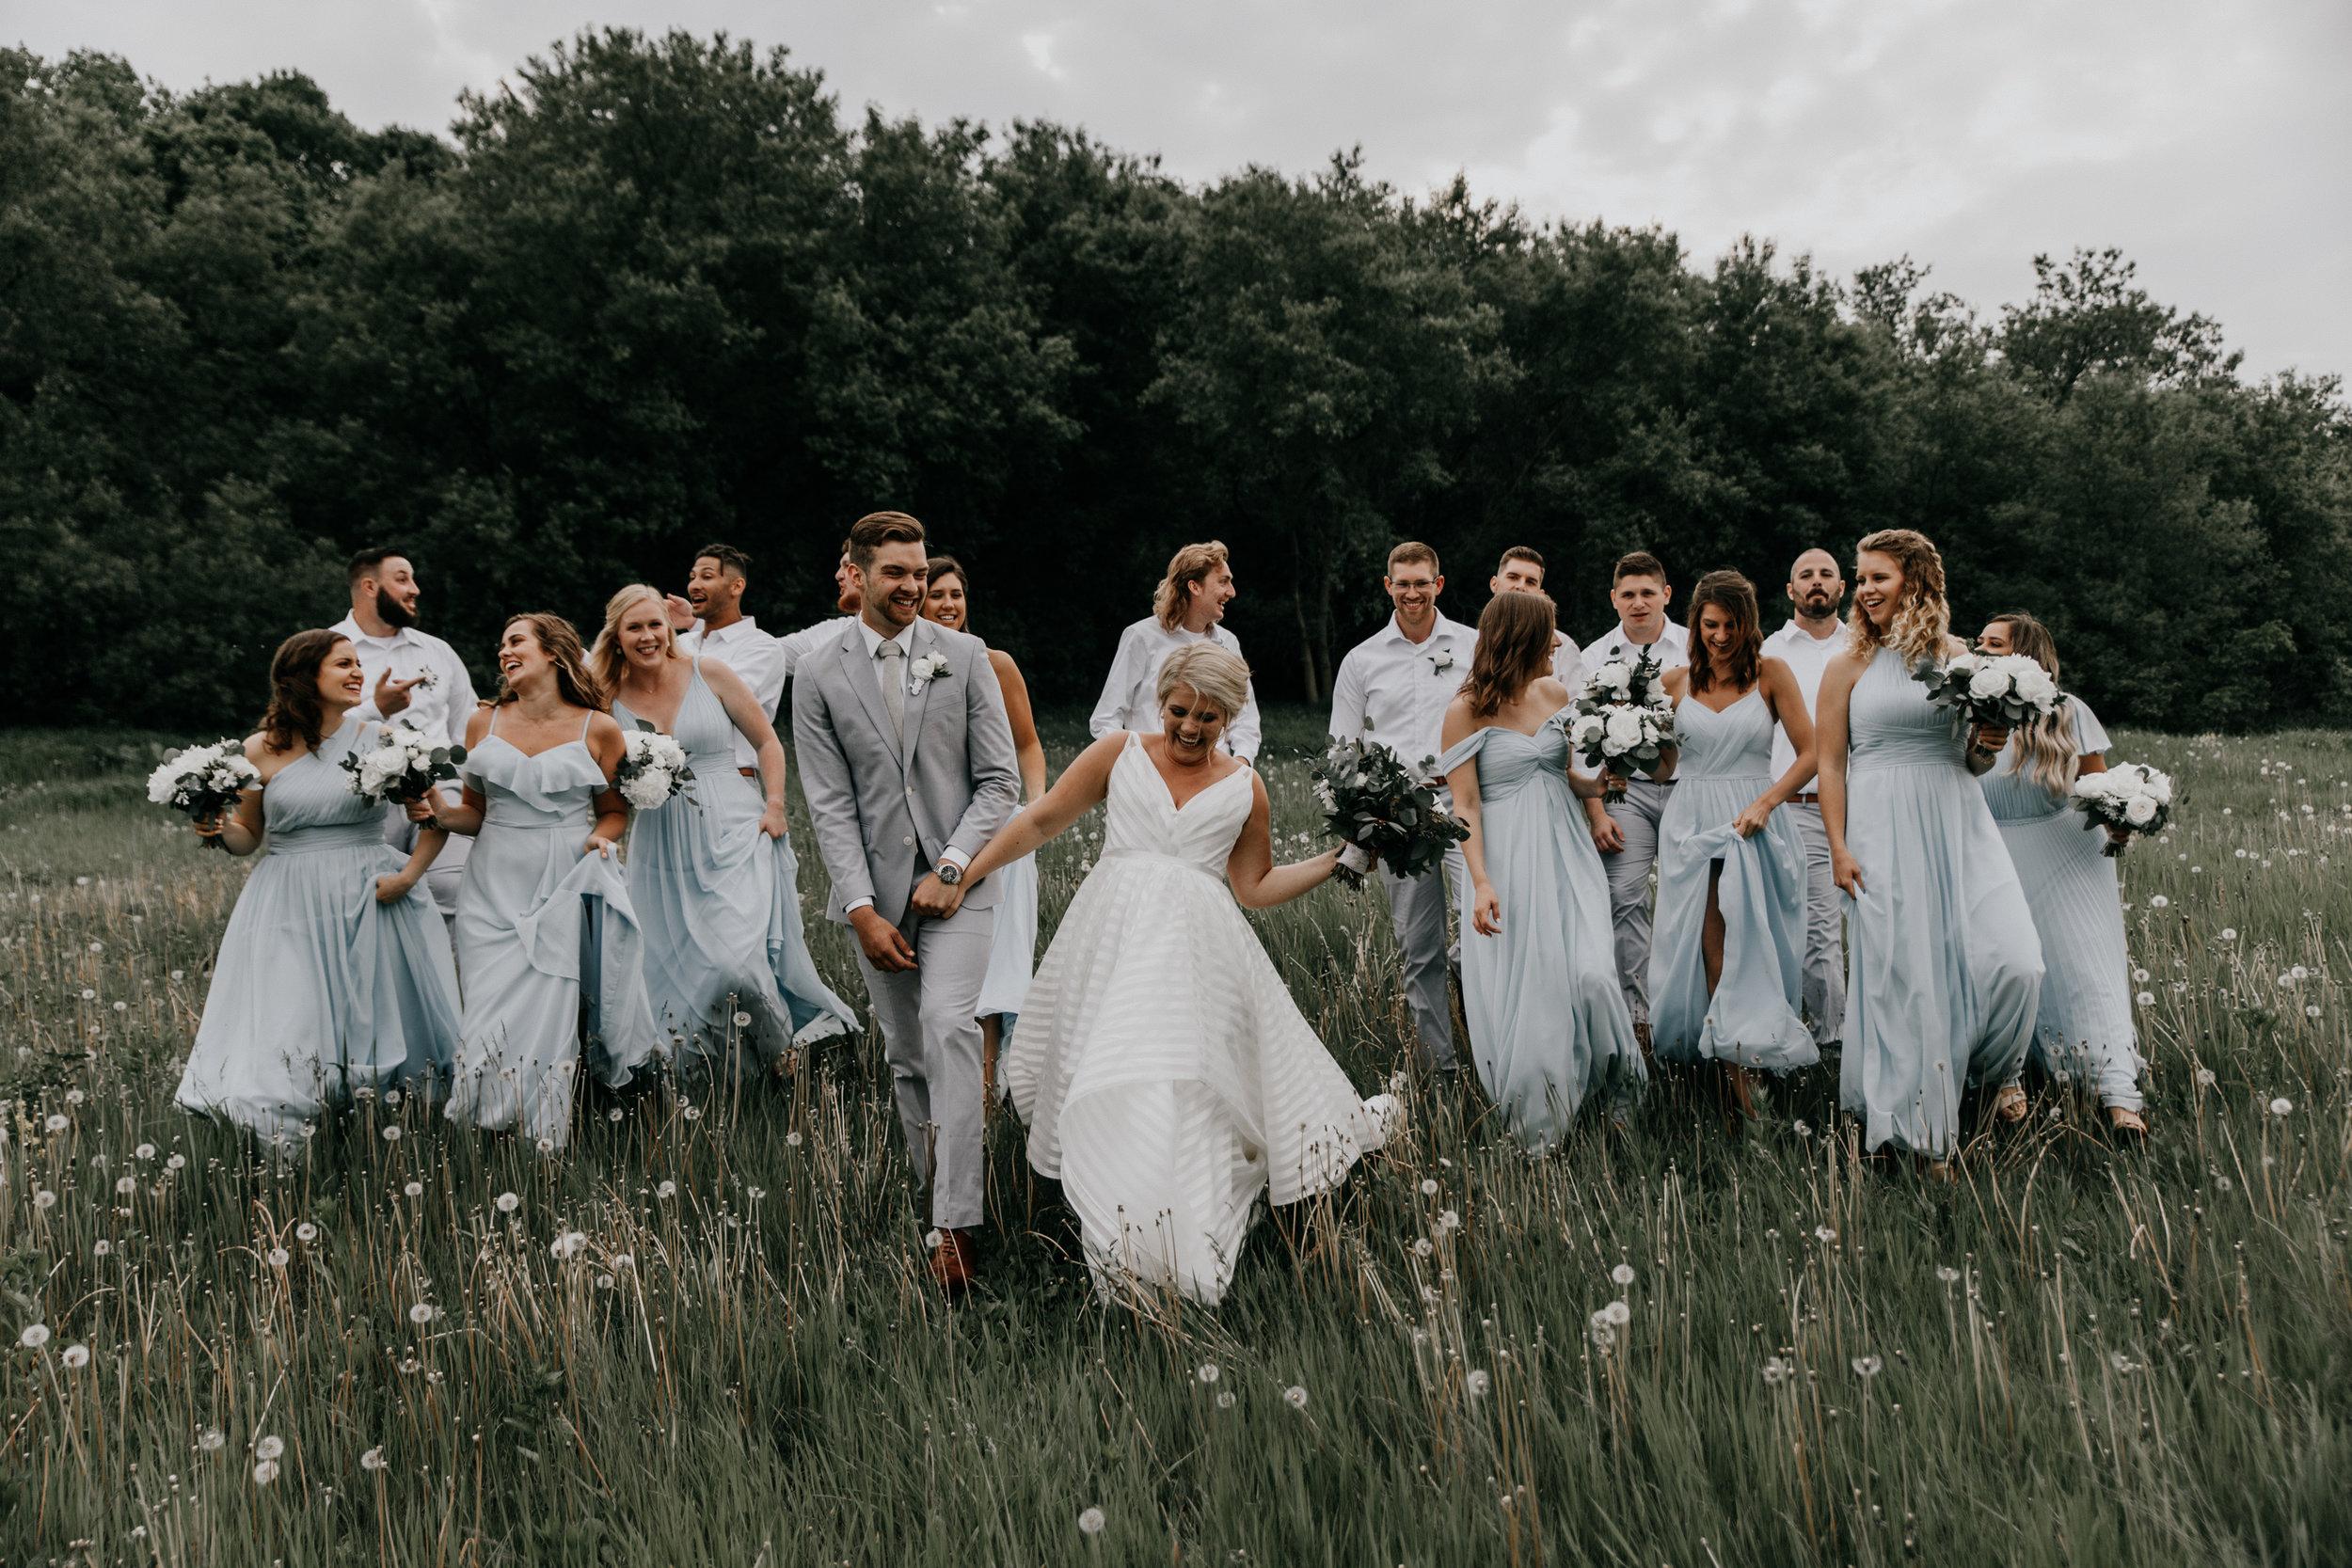 WeddingvideographerinLosAngeles.jpg